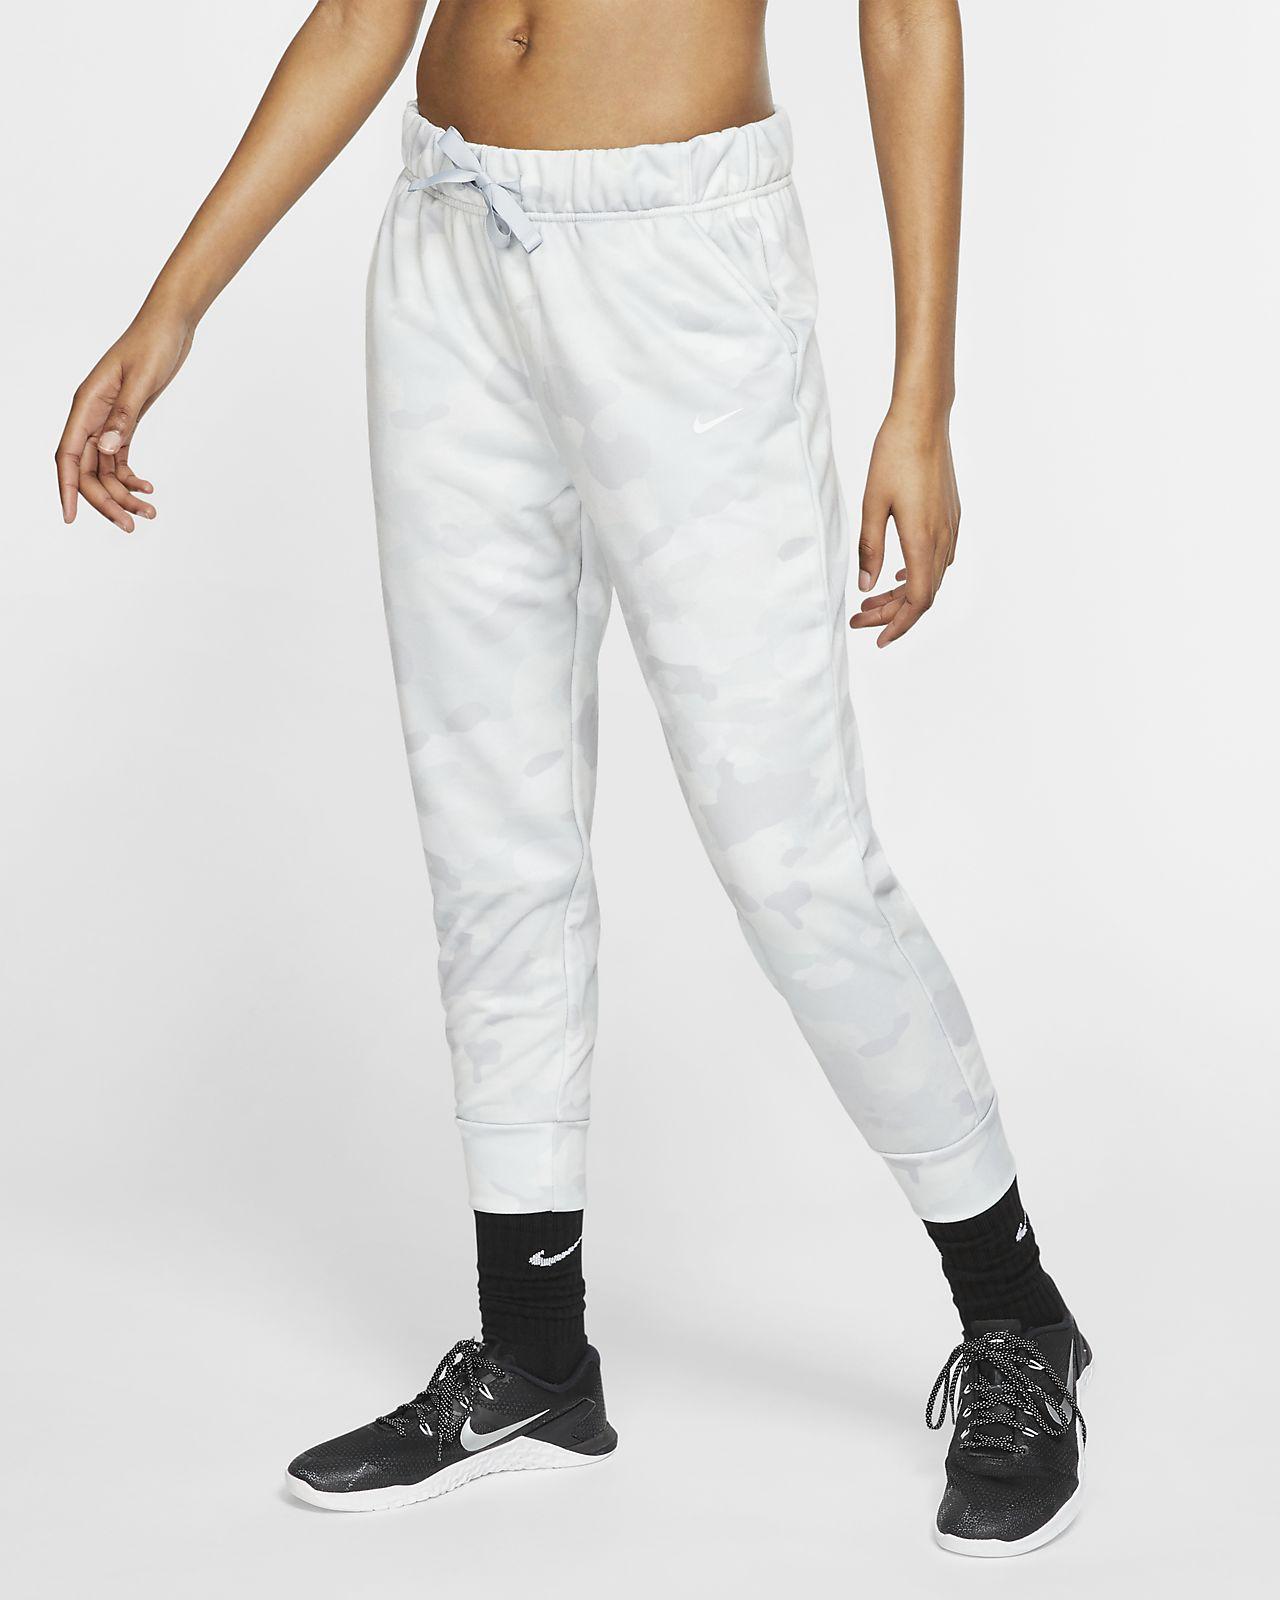 Nike Dri-FIT Icon Clash Women's 7/8 Fleece Training Pants